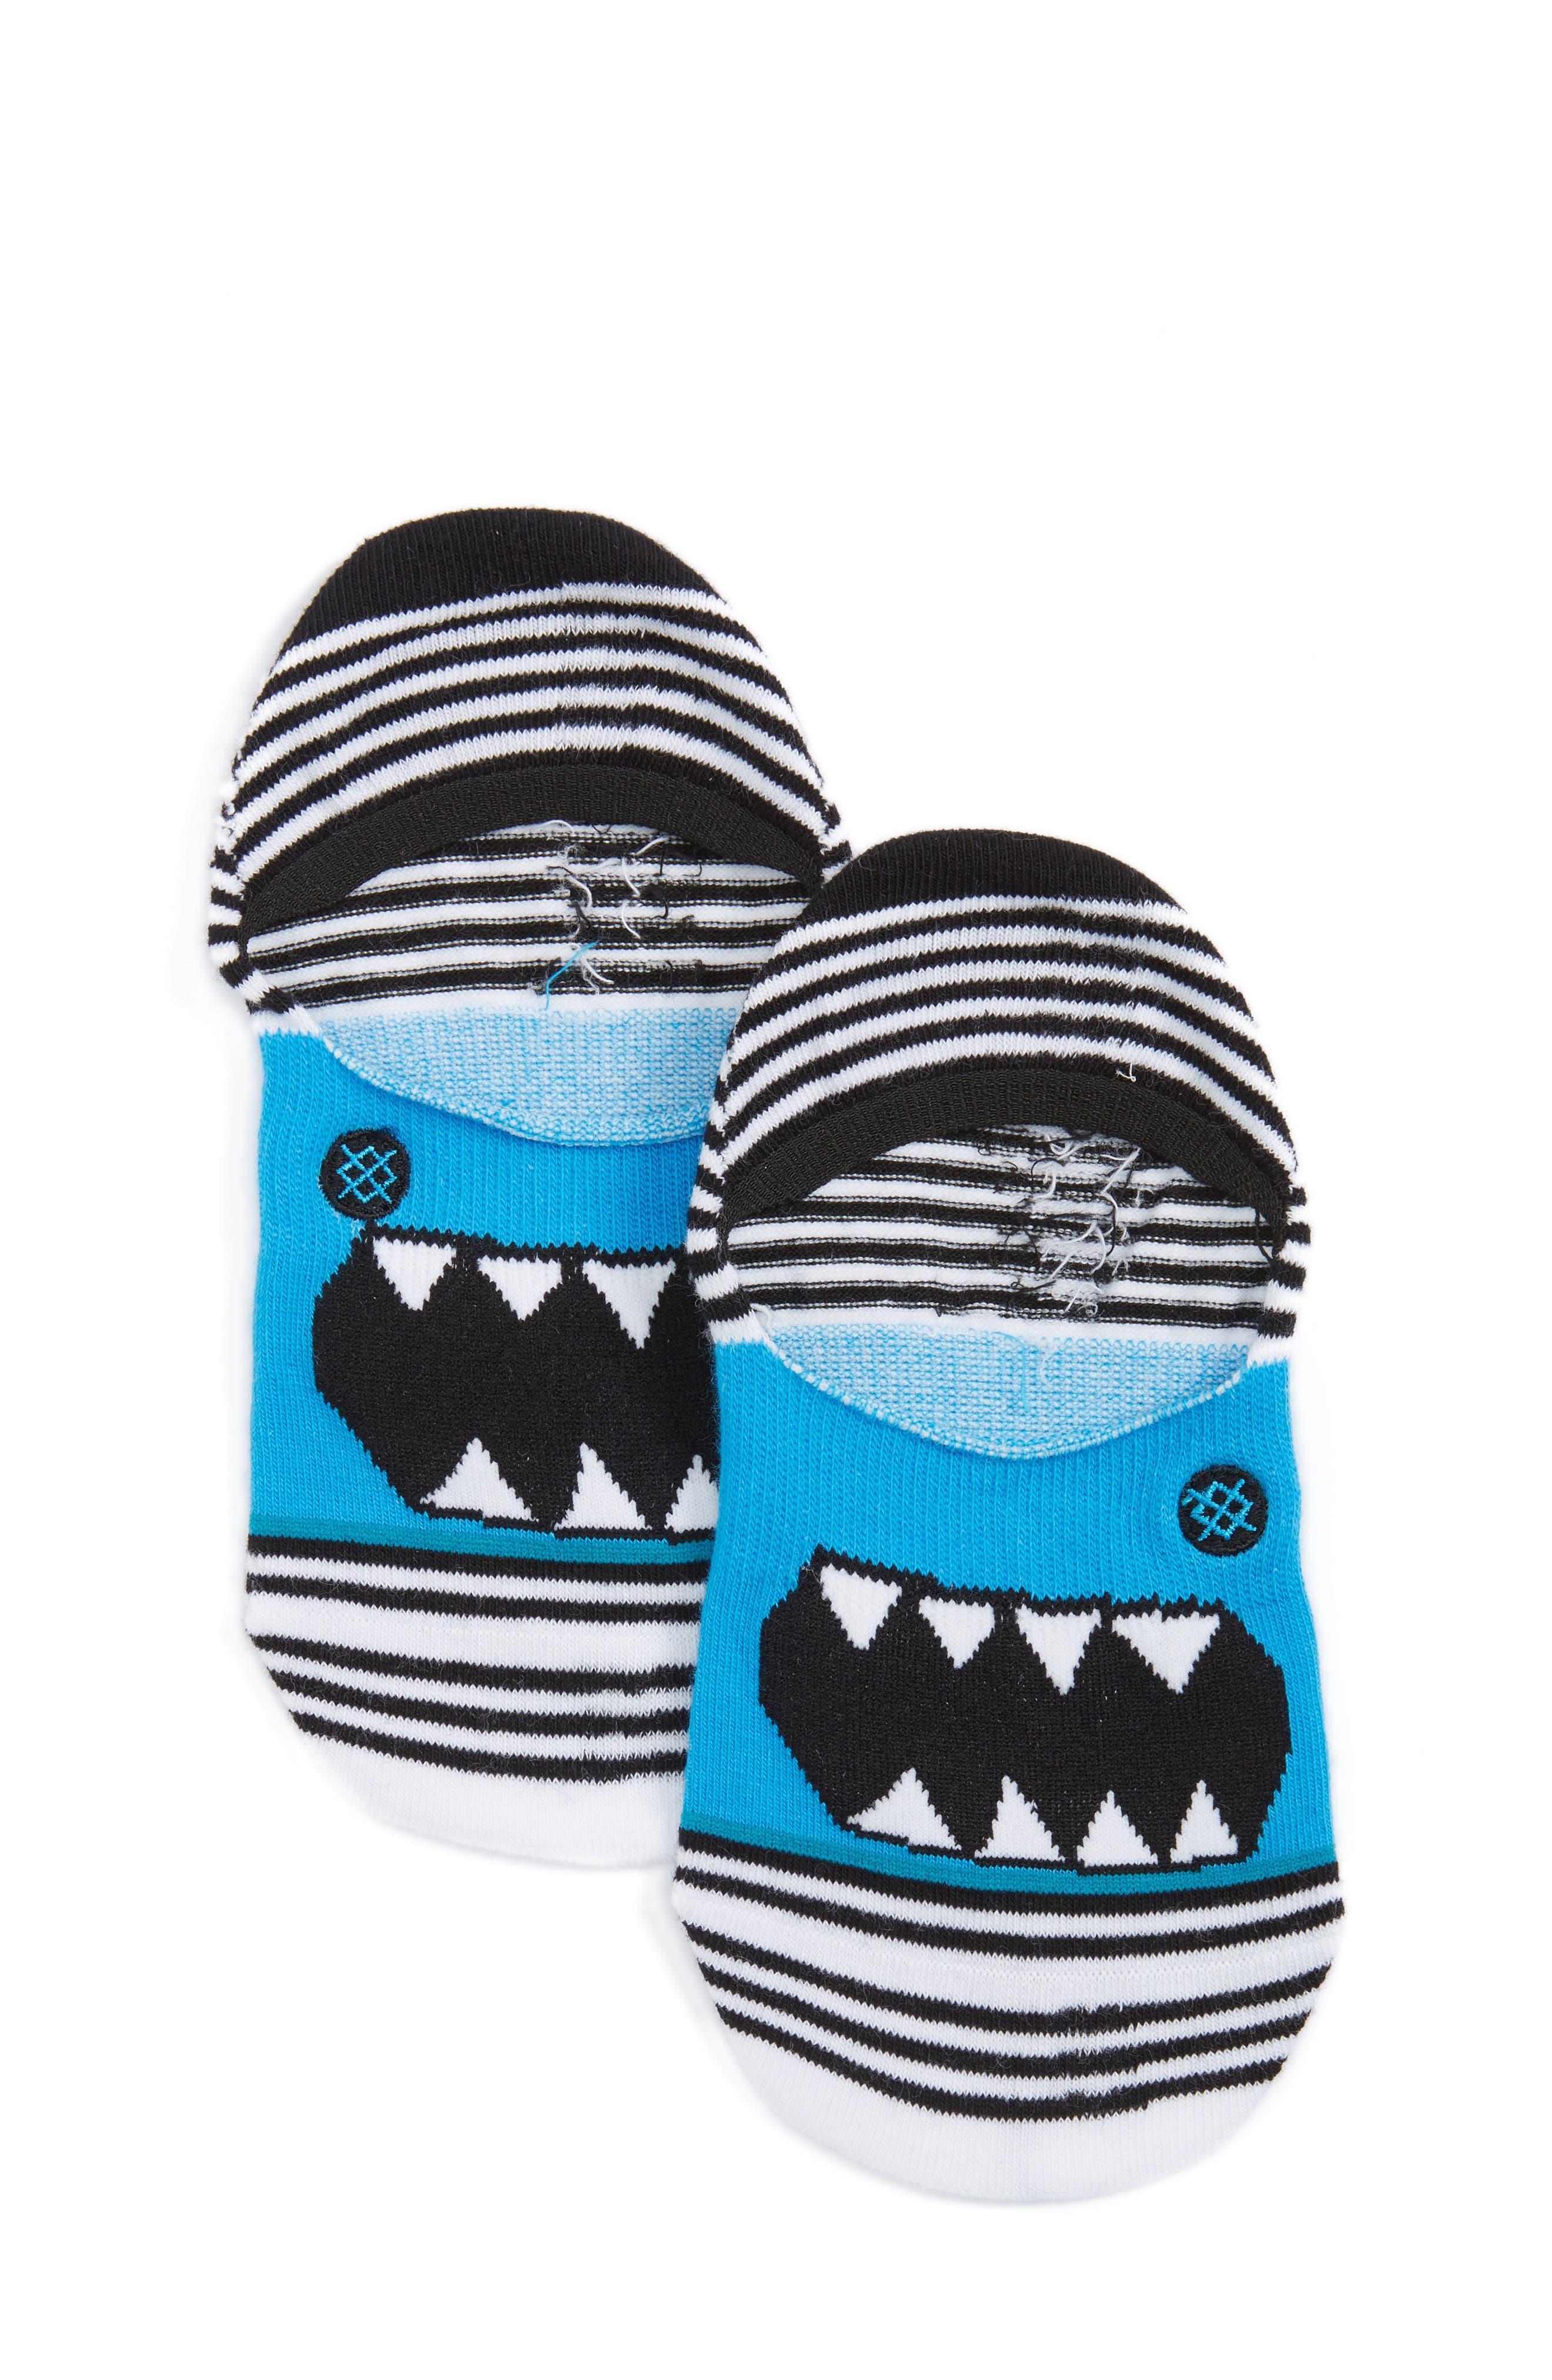 Alternate Image 1 Selected - Stance Sully Ankle Socks (Little Kid & Big Kid)